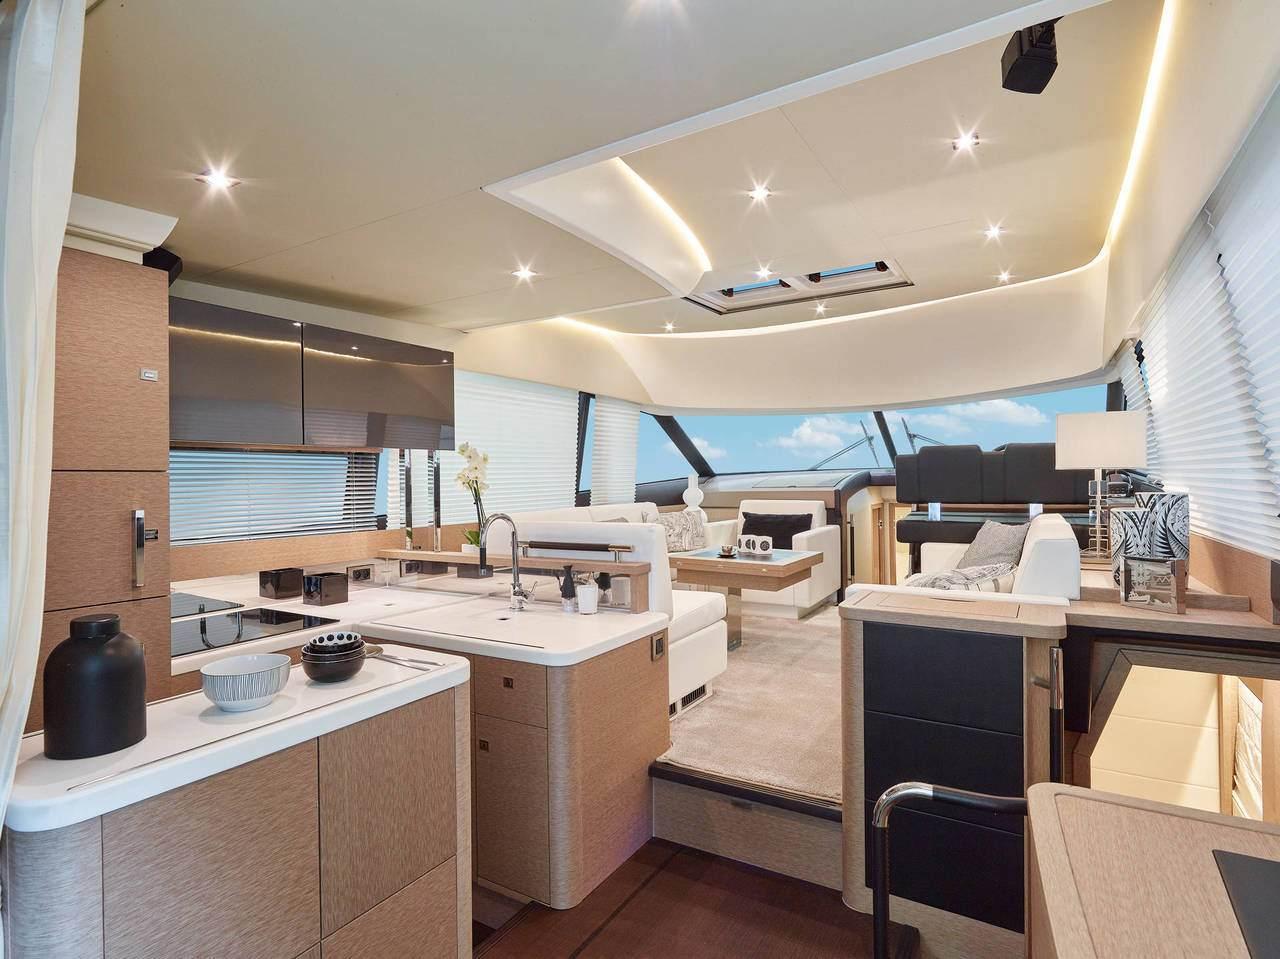 Interior shot onboard a Prestige Yacht